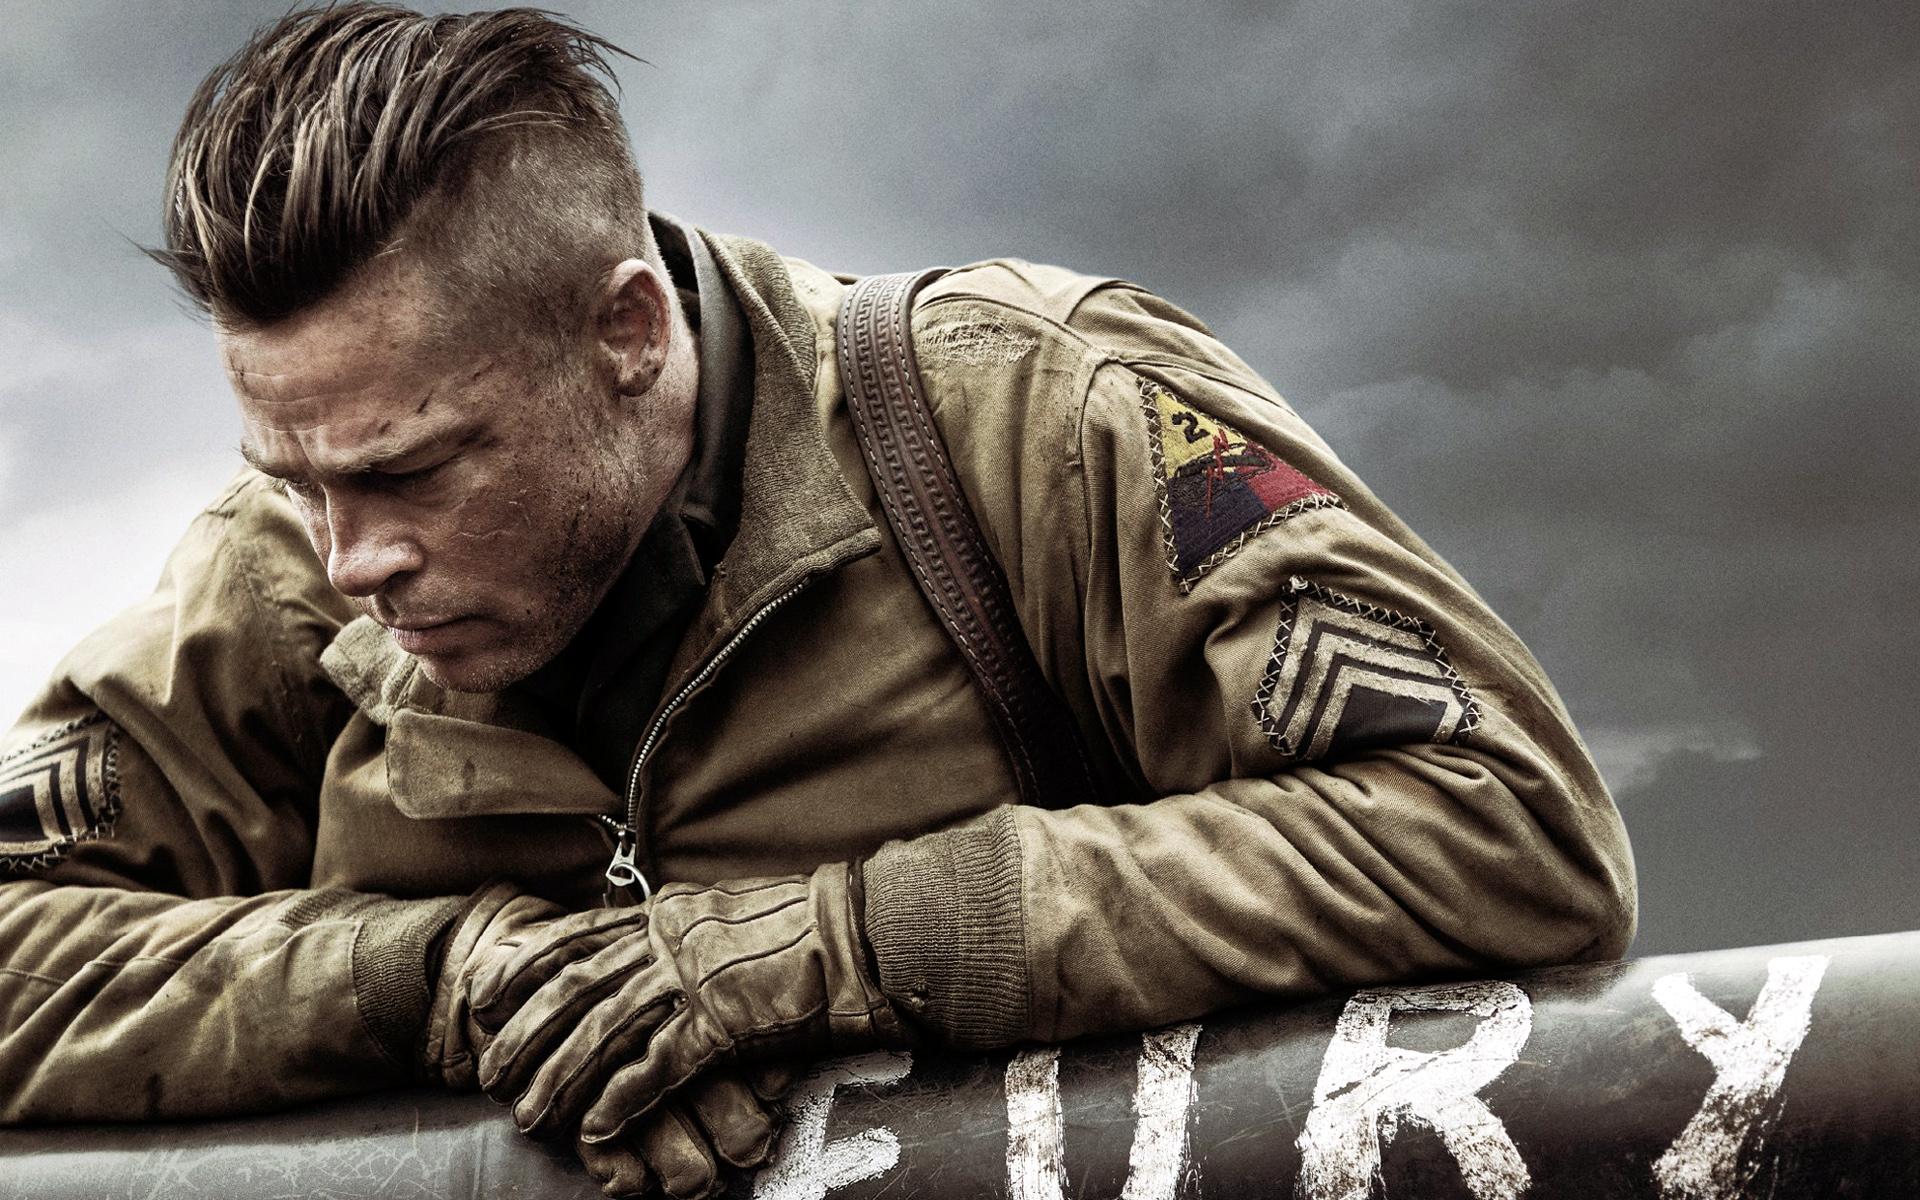 Brad Pitt in Fury Wallpapers HD Wallpapers 1920x1200